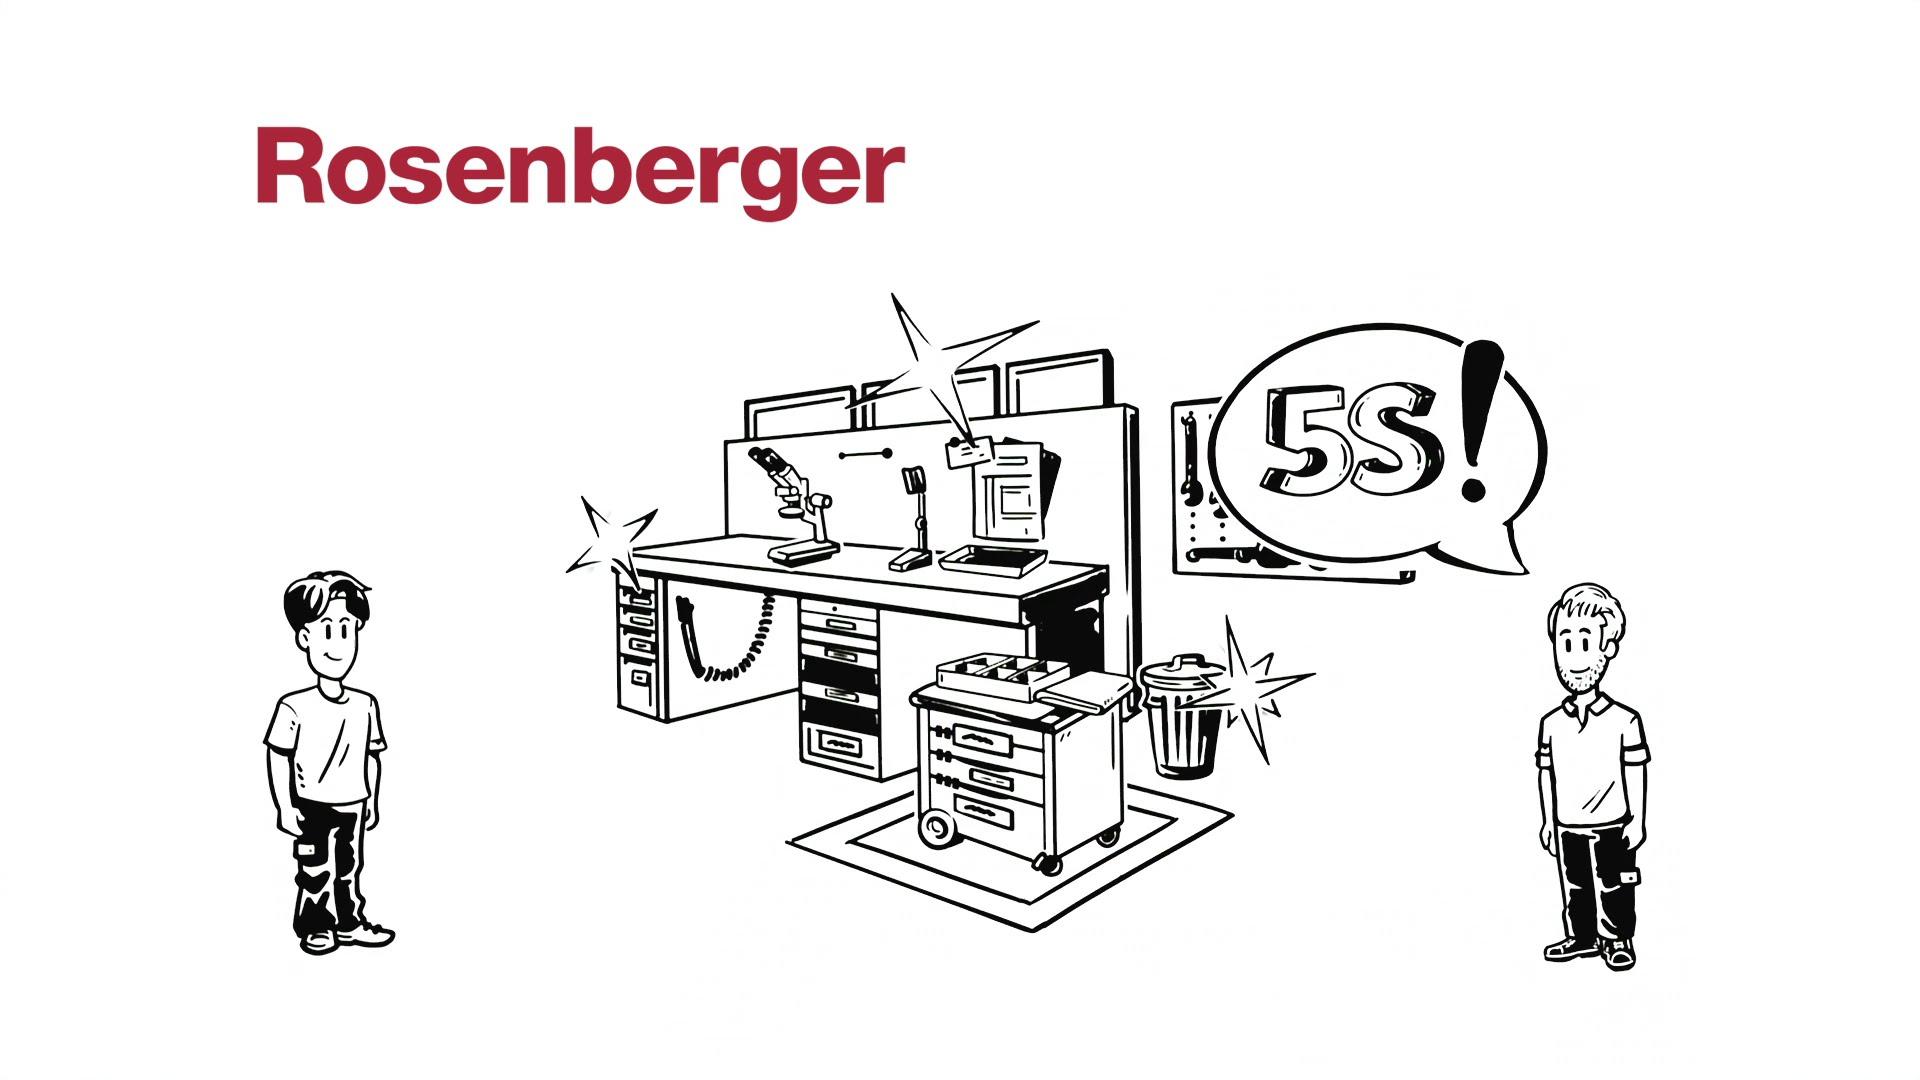 5s Lean Video By Rosenberger